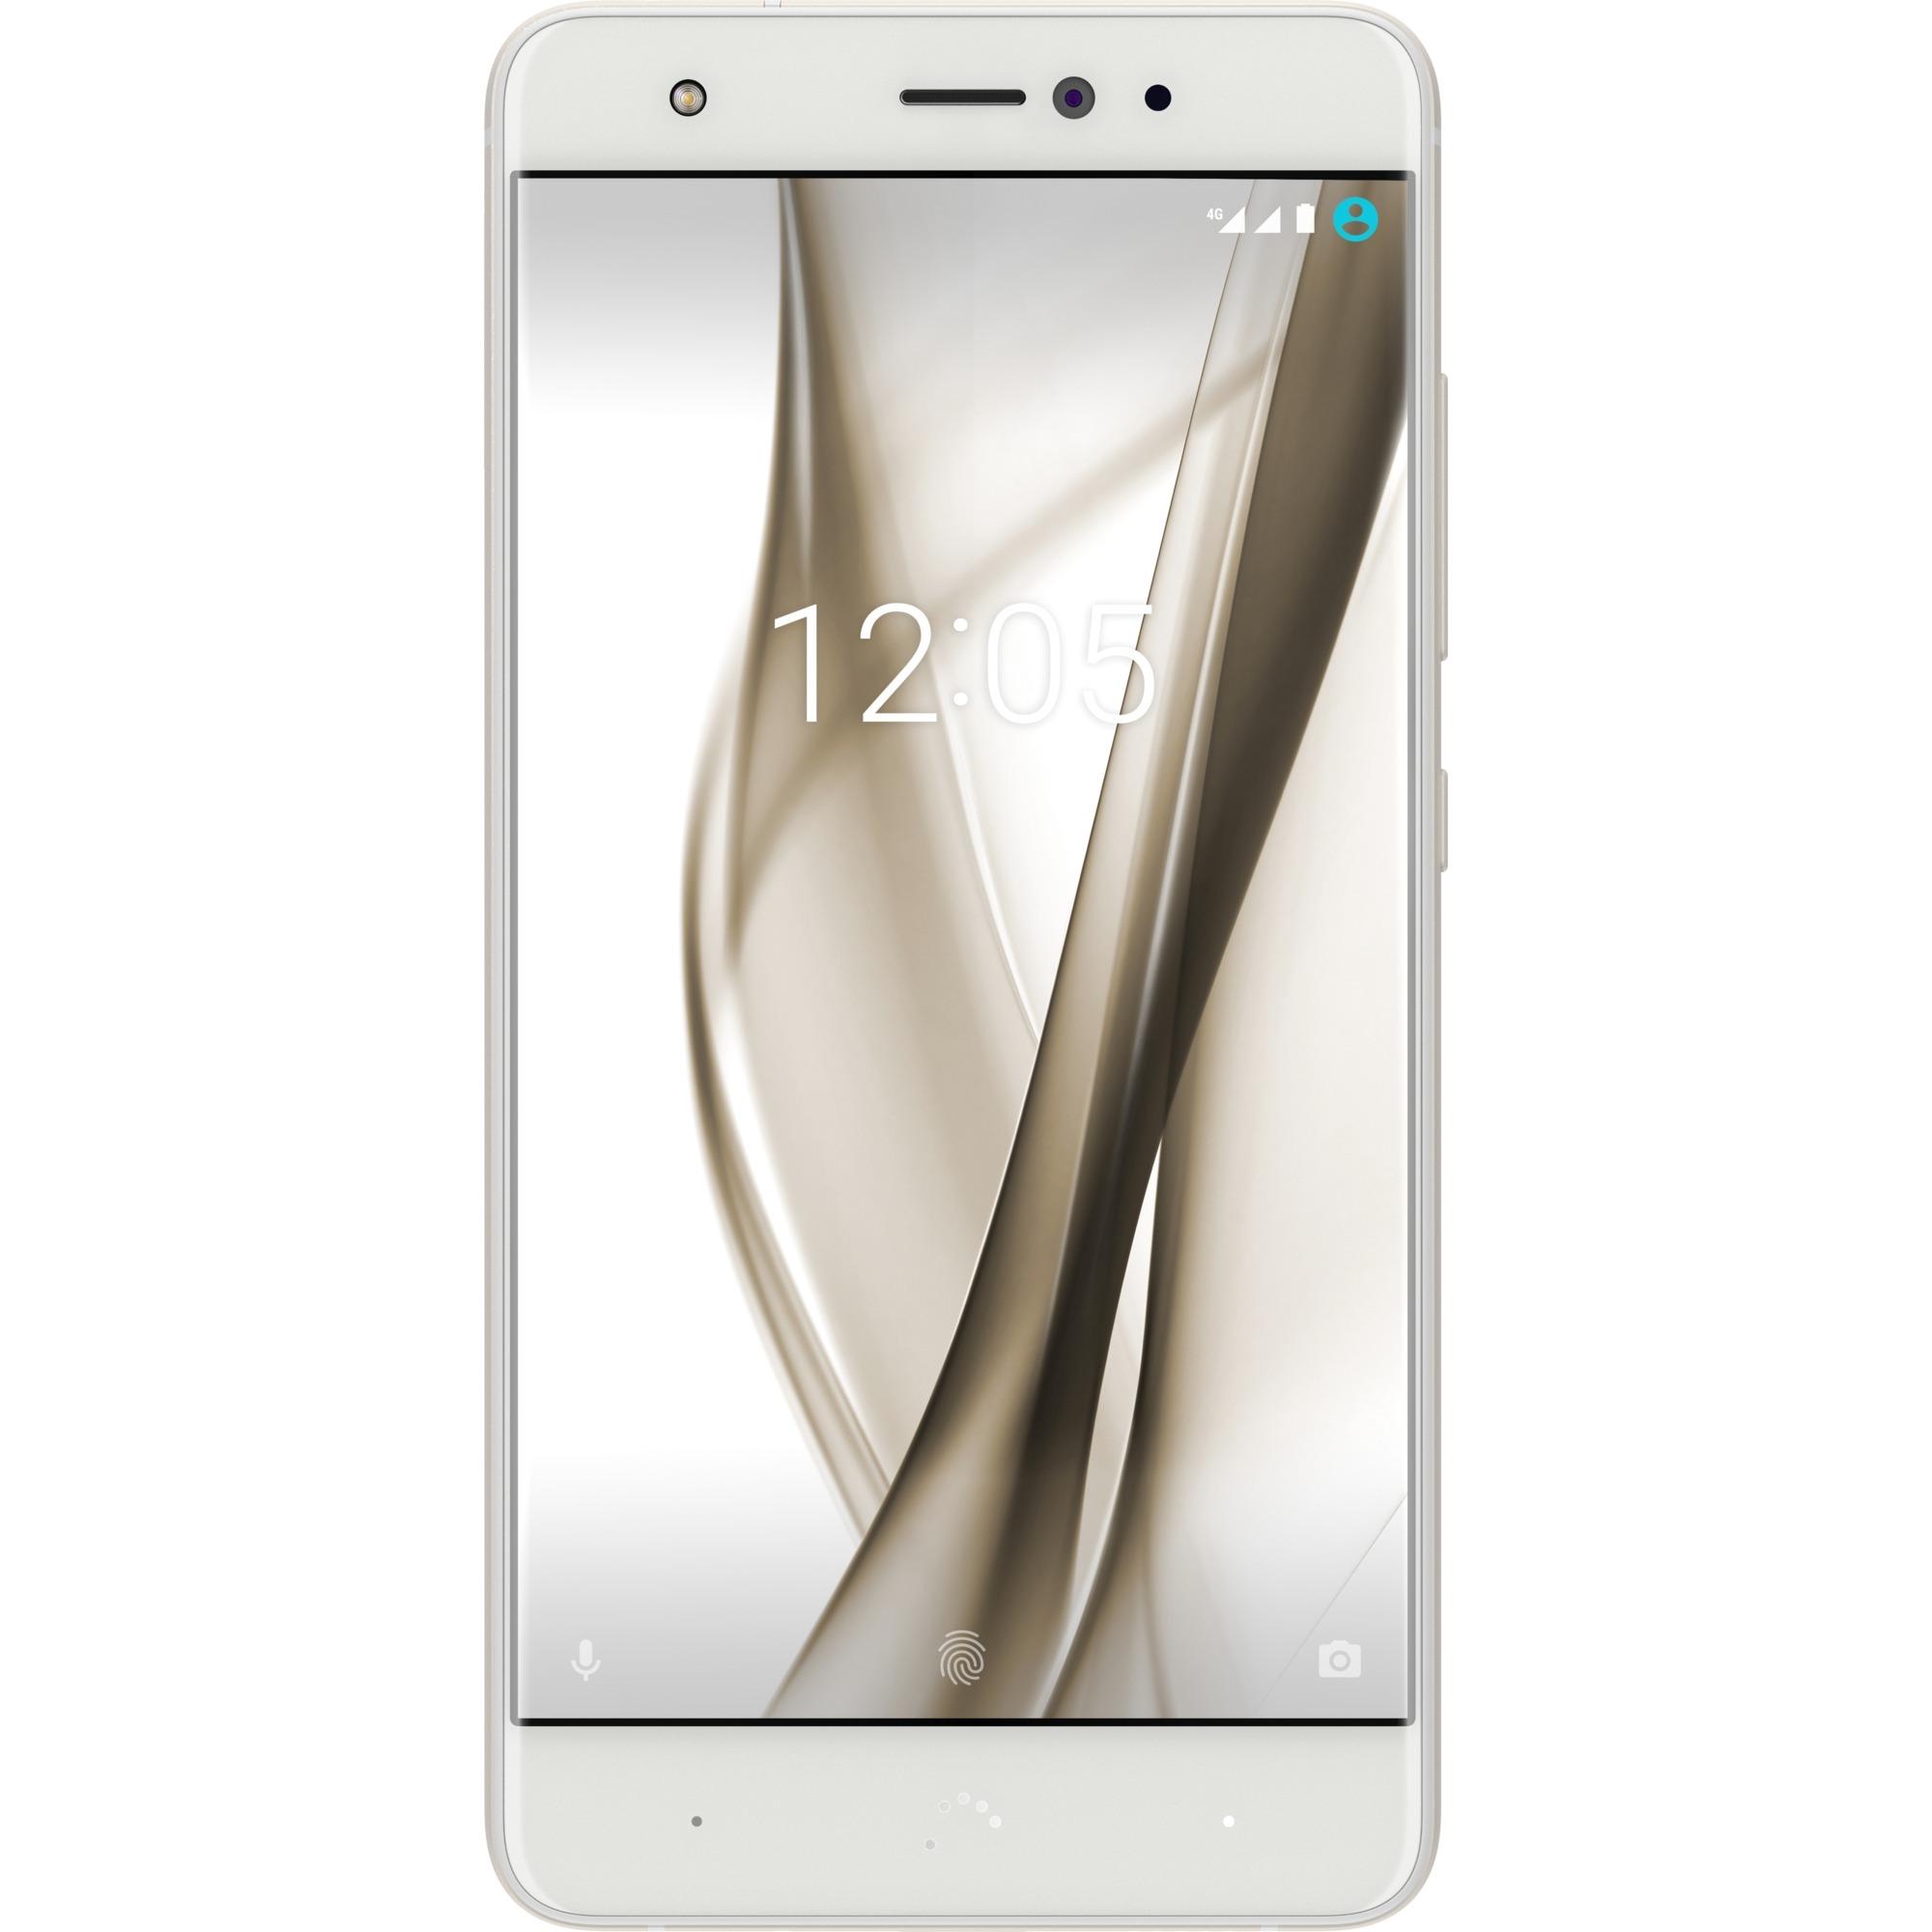 Aquaris X Pro SIM doble 4G 64GB Color blanco, Móvil